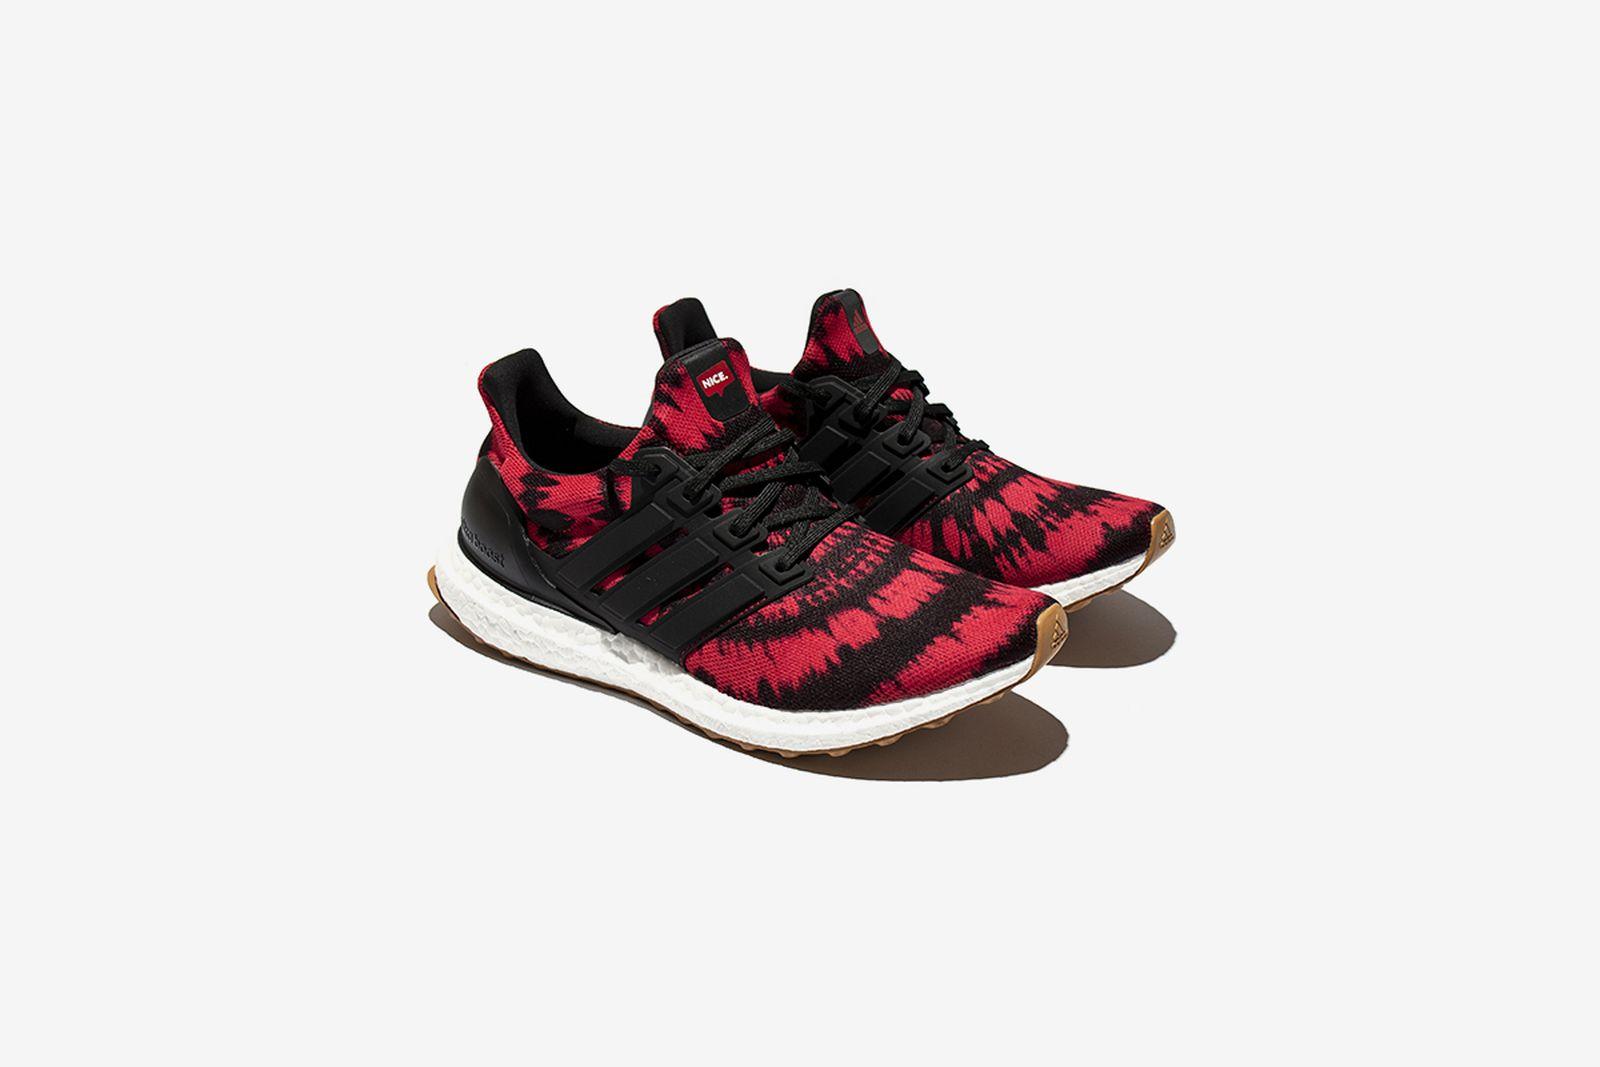 nice-kicks-adidas-ultraboost-no-vacancy-release-date-price-1-01